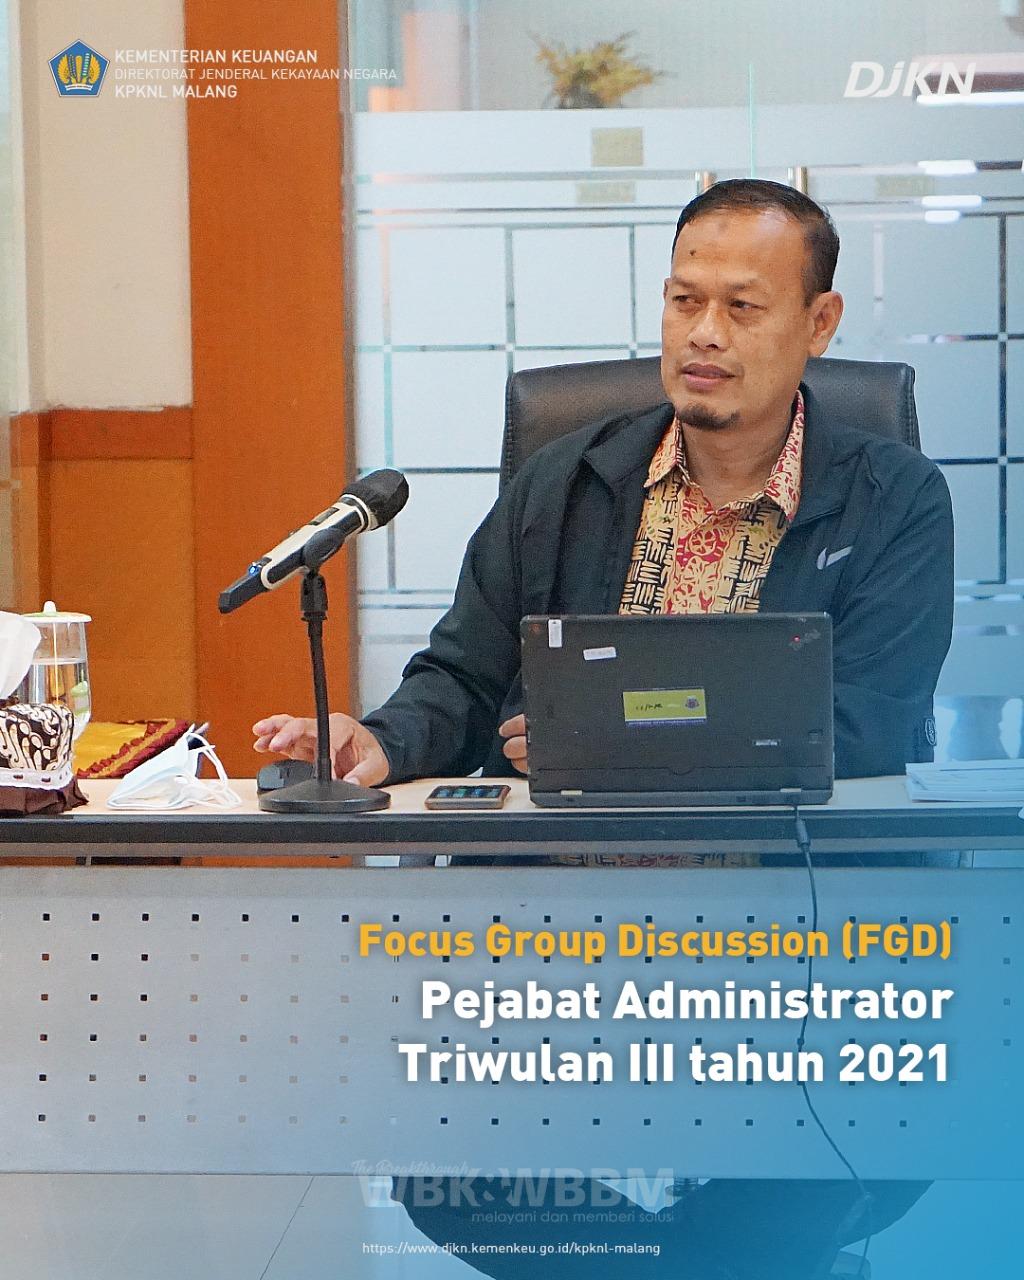 KPKNL Malang menggelar Focus Group Discussion Pejabat Administrator Triwulan III